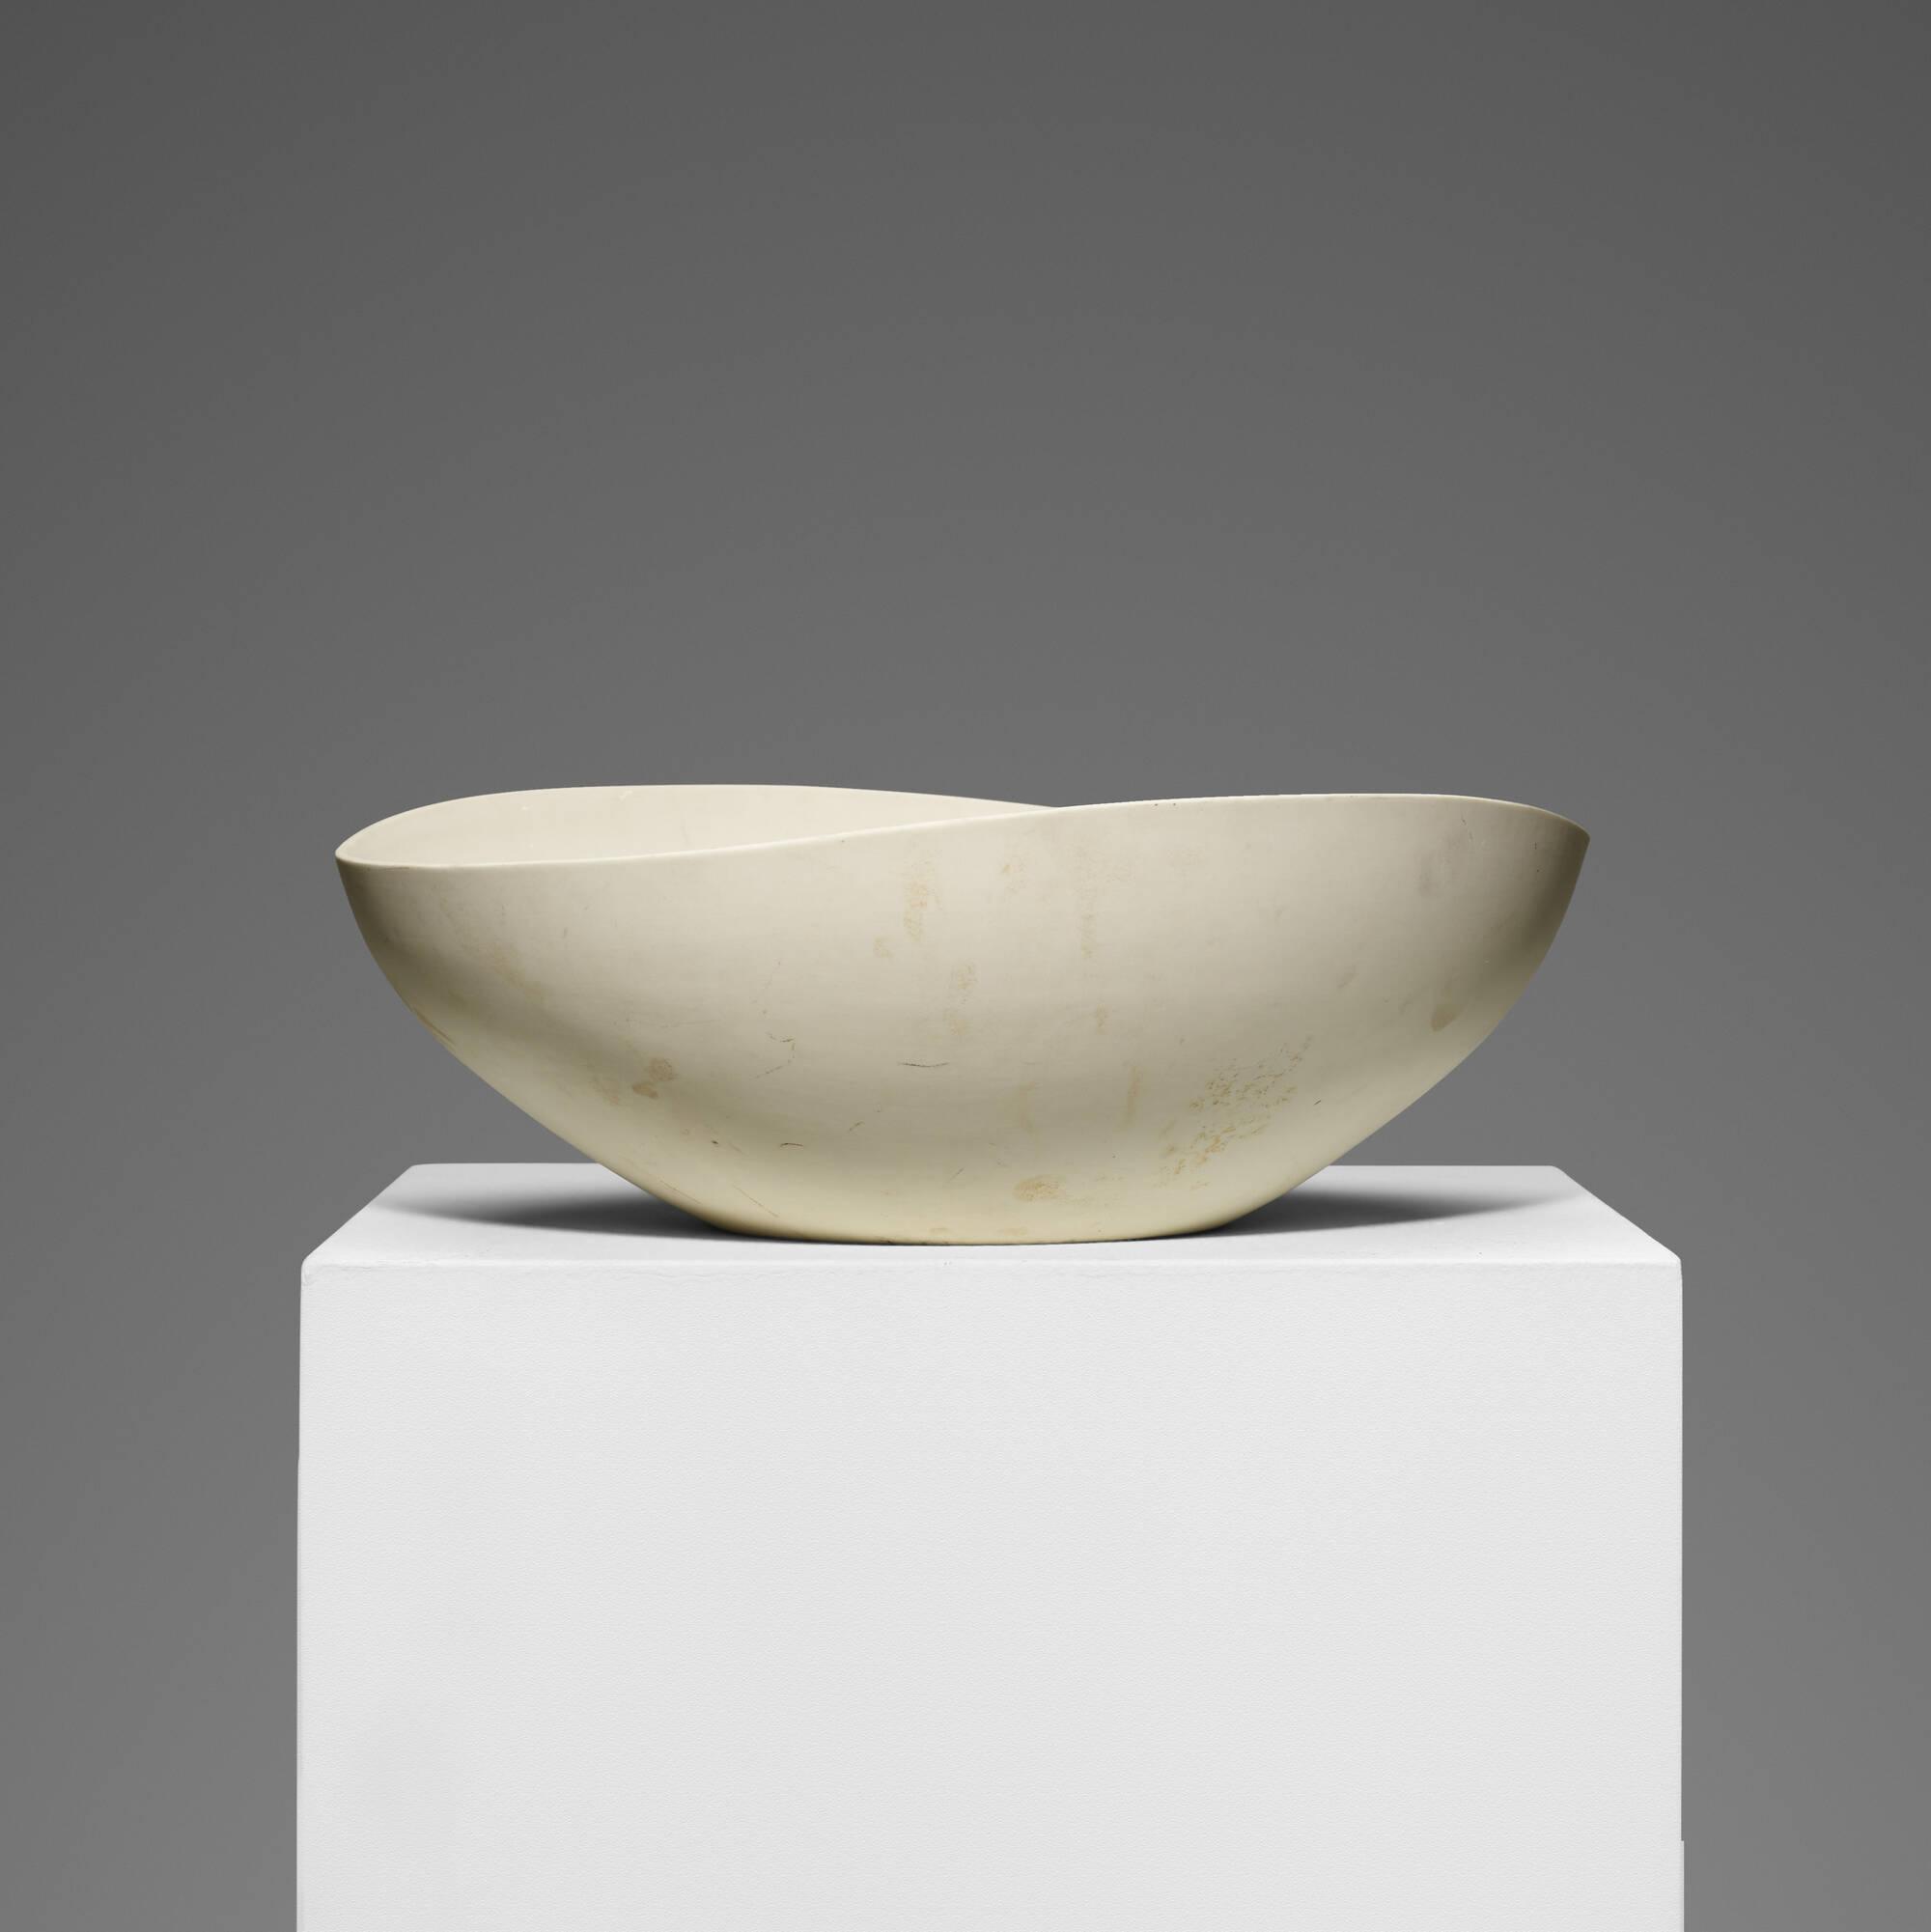 325: Eva Zeisel / prototype Museum Shape bowl (1 of 2)